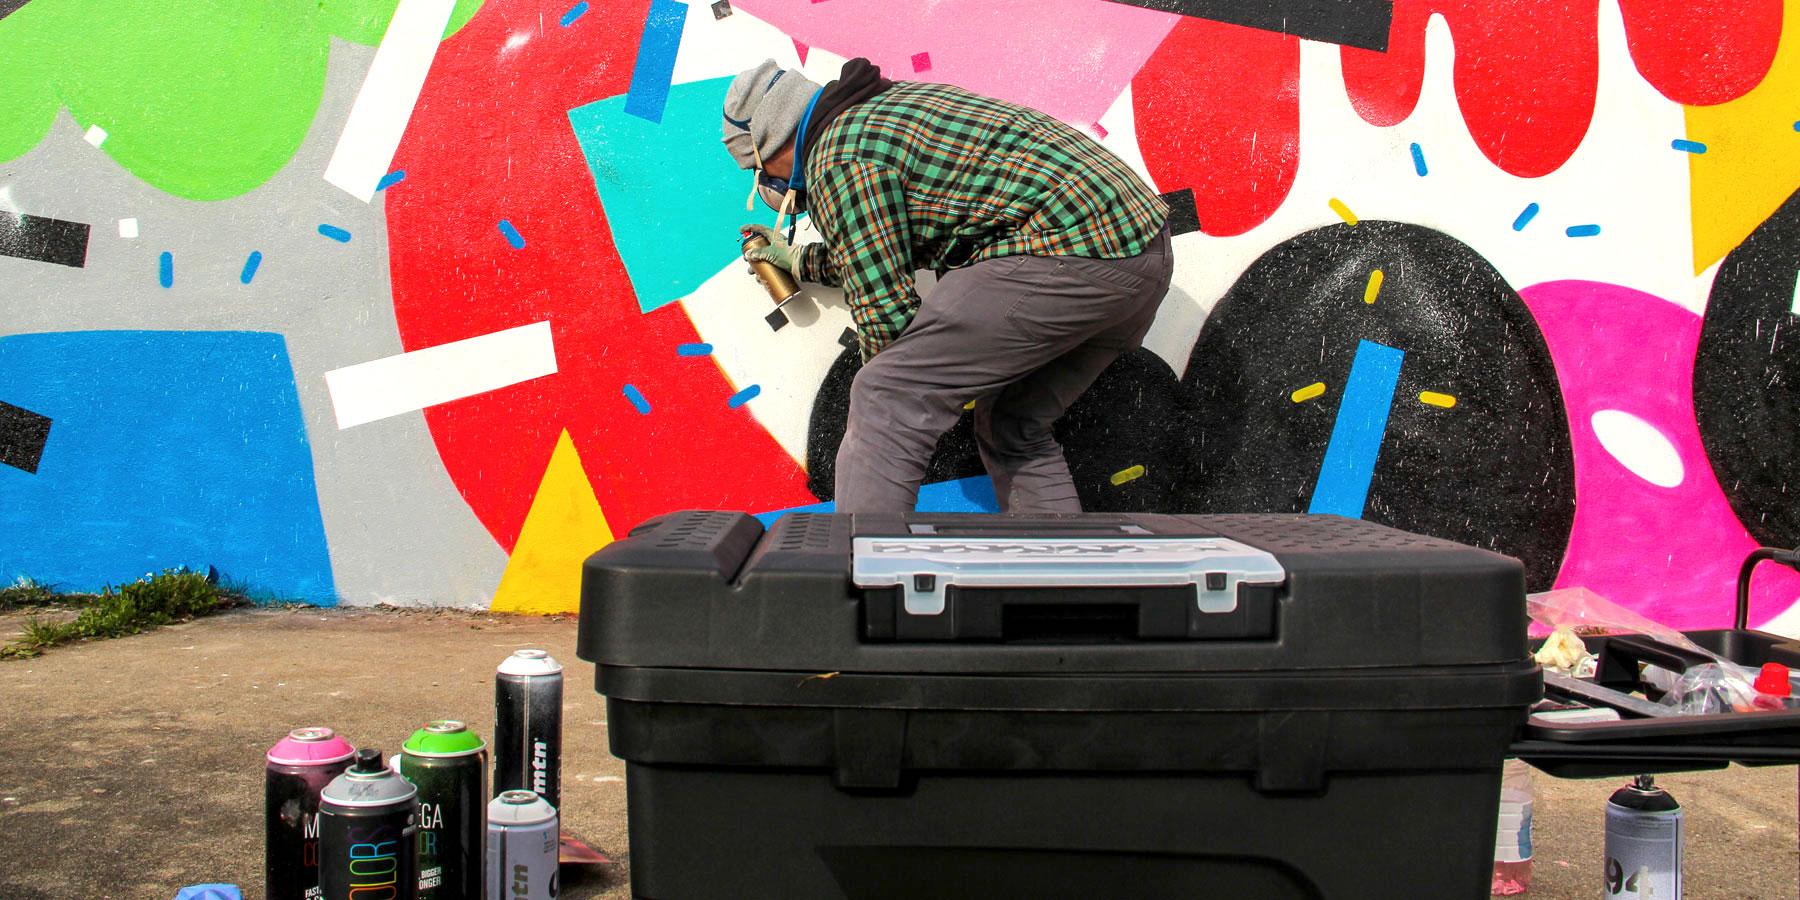 cornwall-mural-artist-painting-street-art